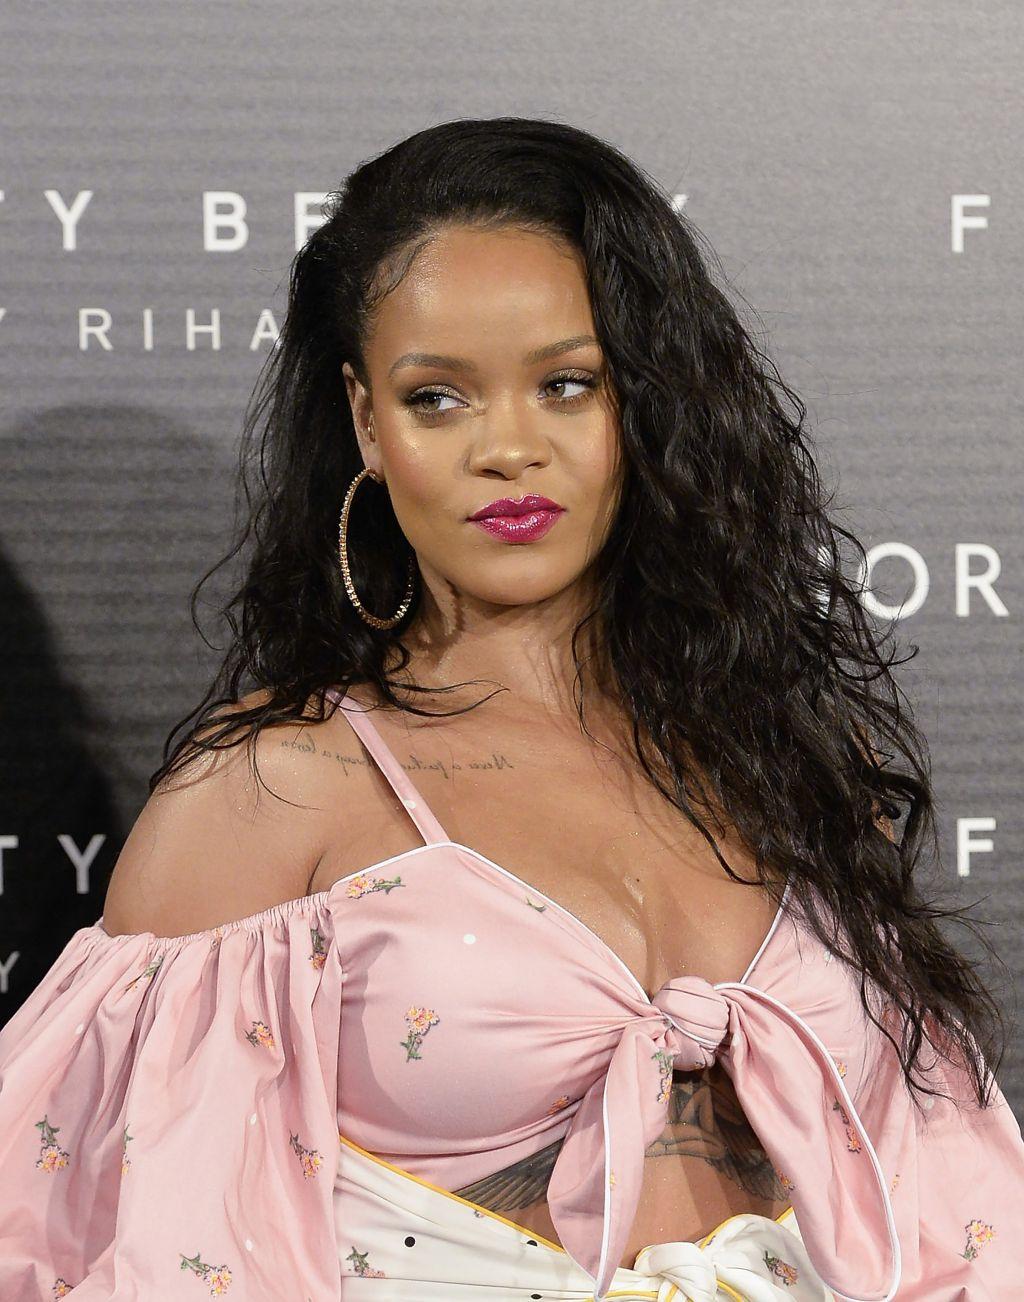 Rihanna Fenty Beauty Presentation in Madrid